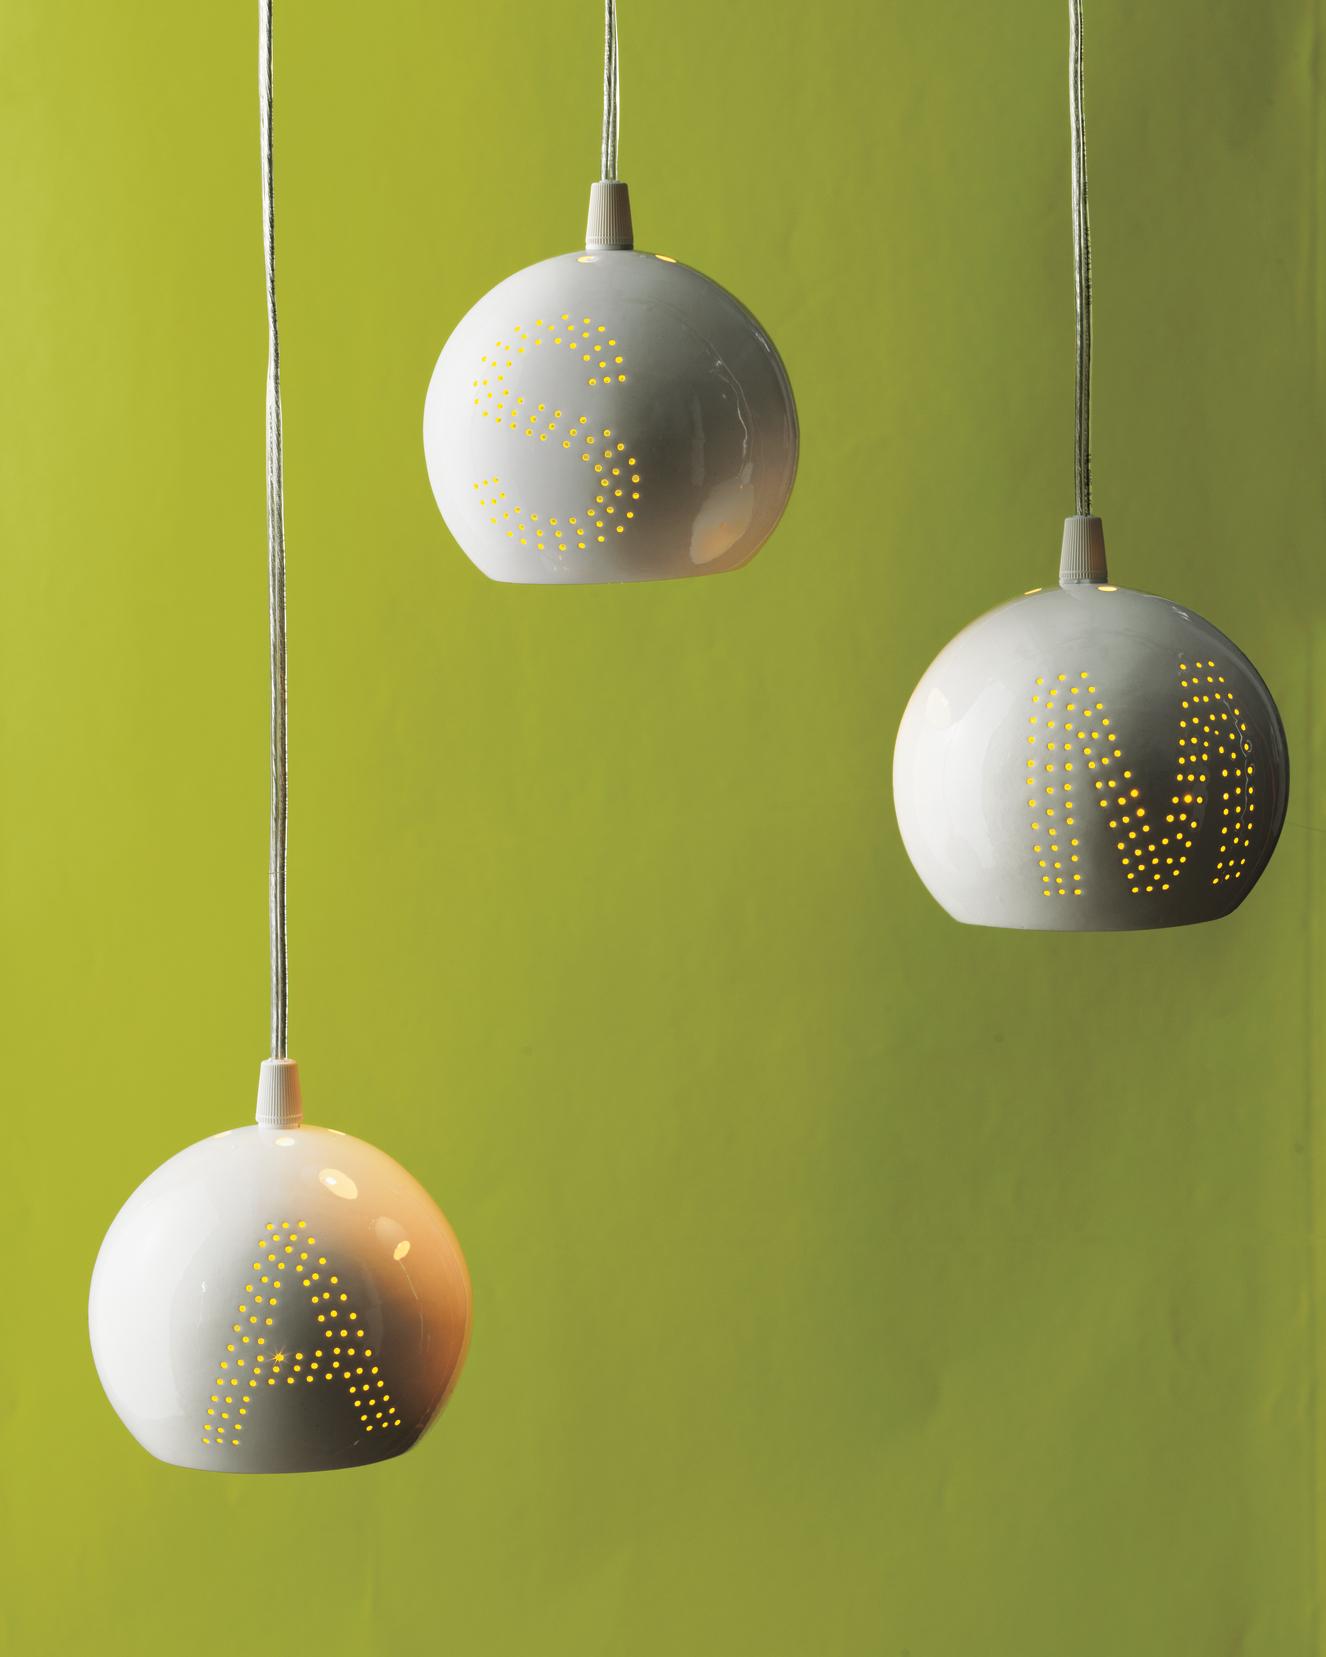 hanging-lights-mwd108401.jpg